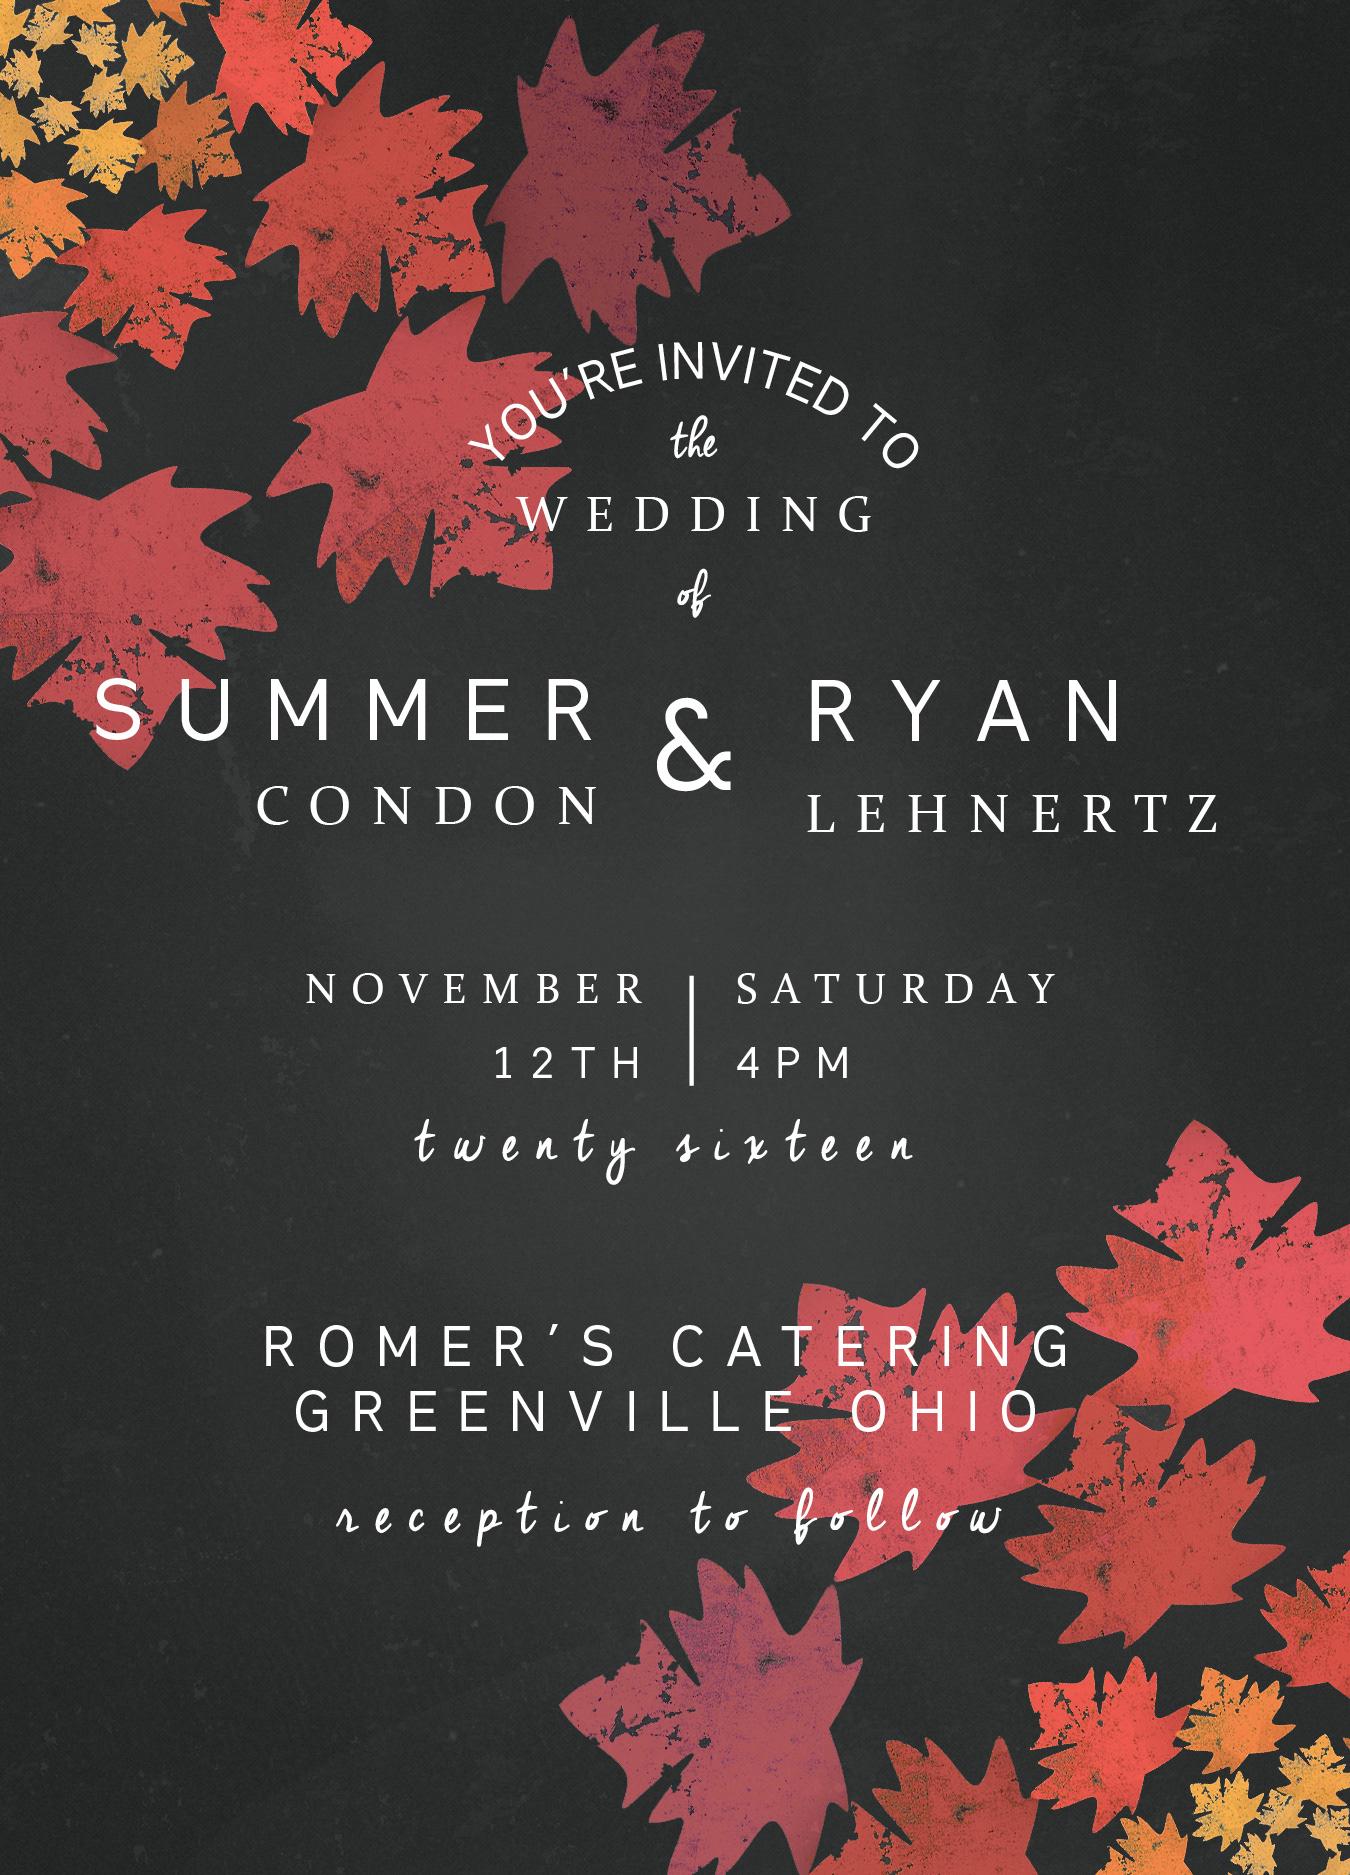 Damon Condon - Lehnertz Wedding Invite